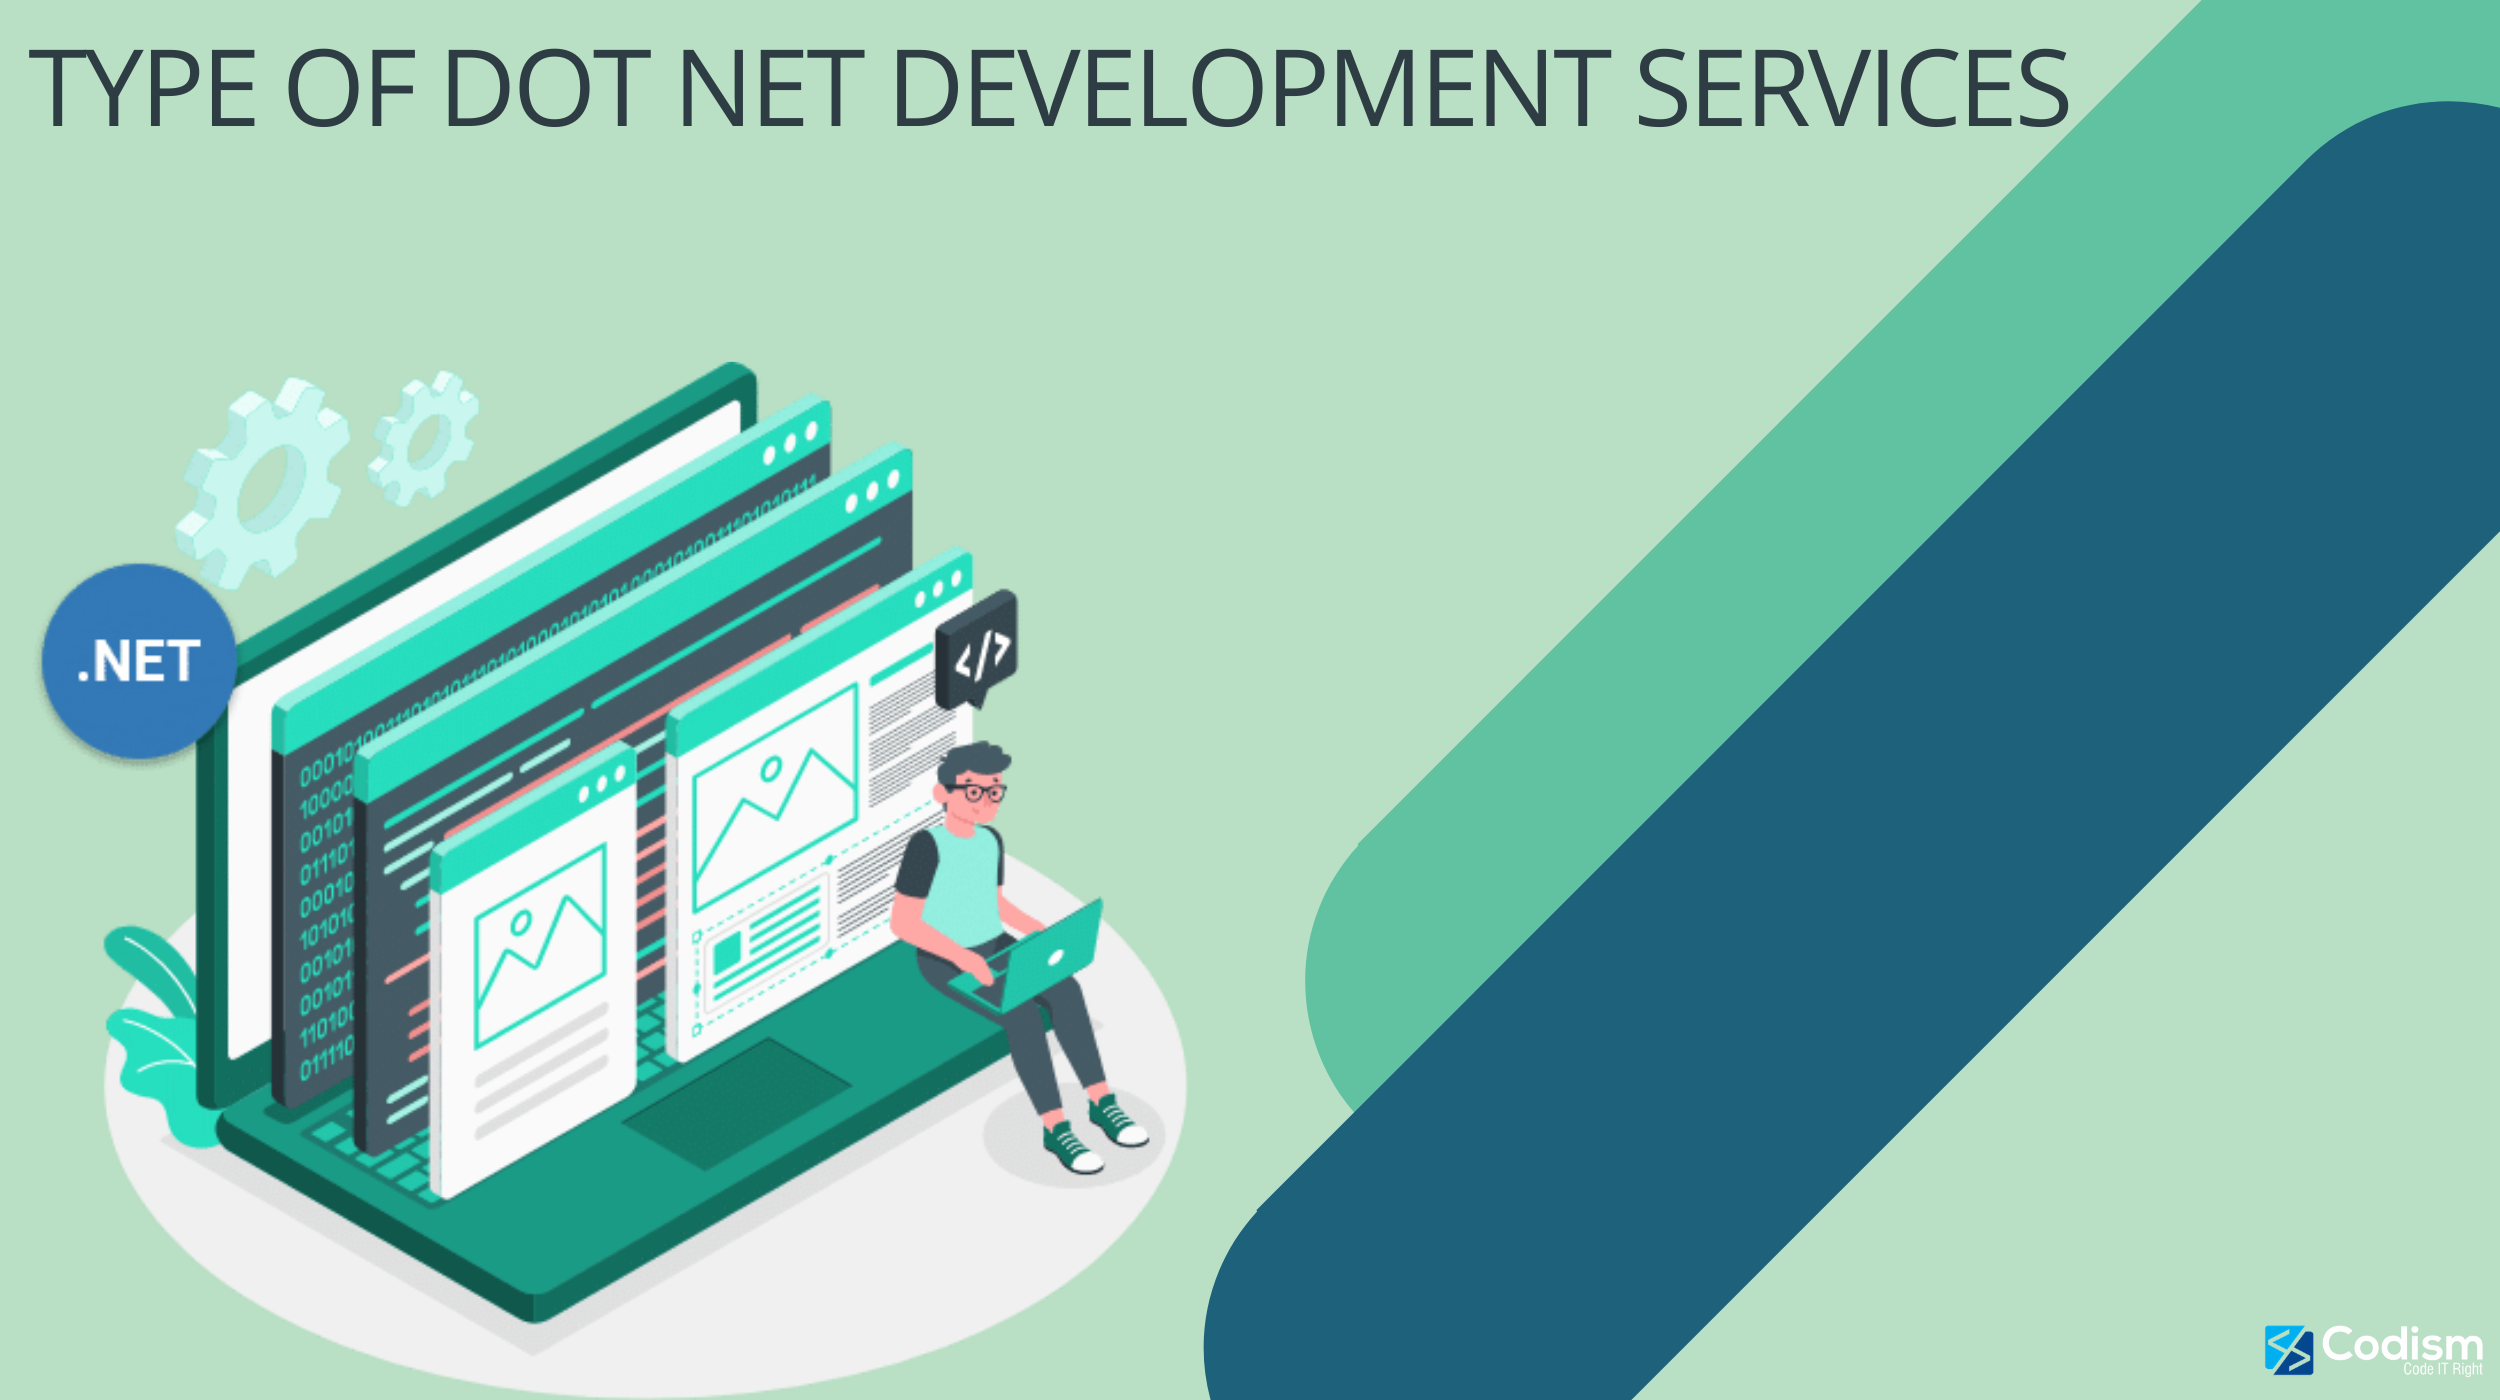 Type of Dot Net Development Services